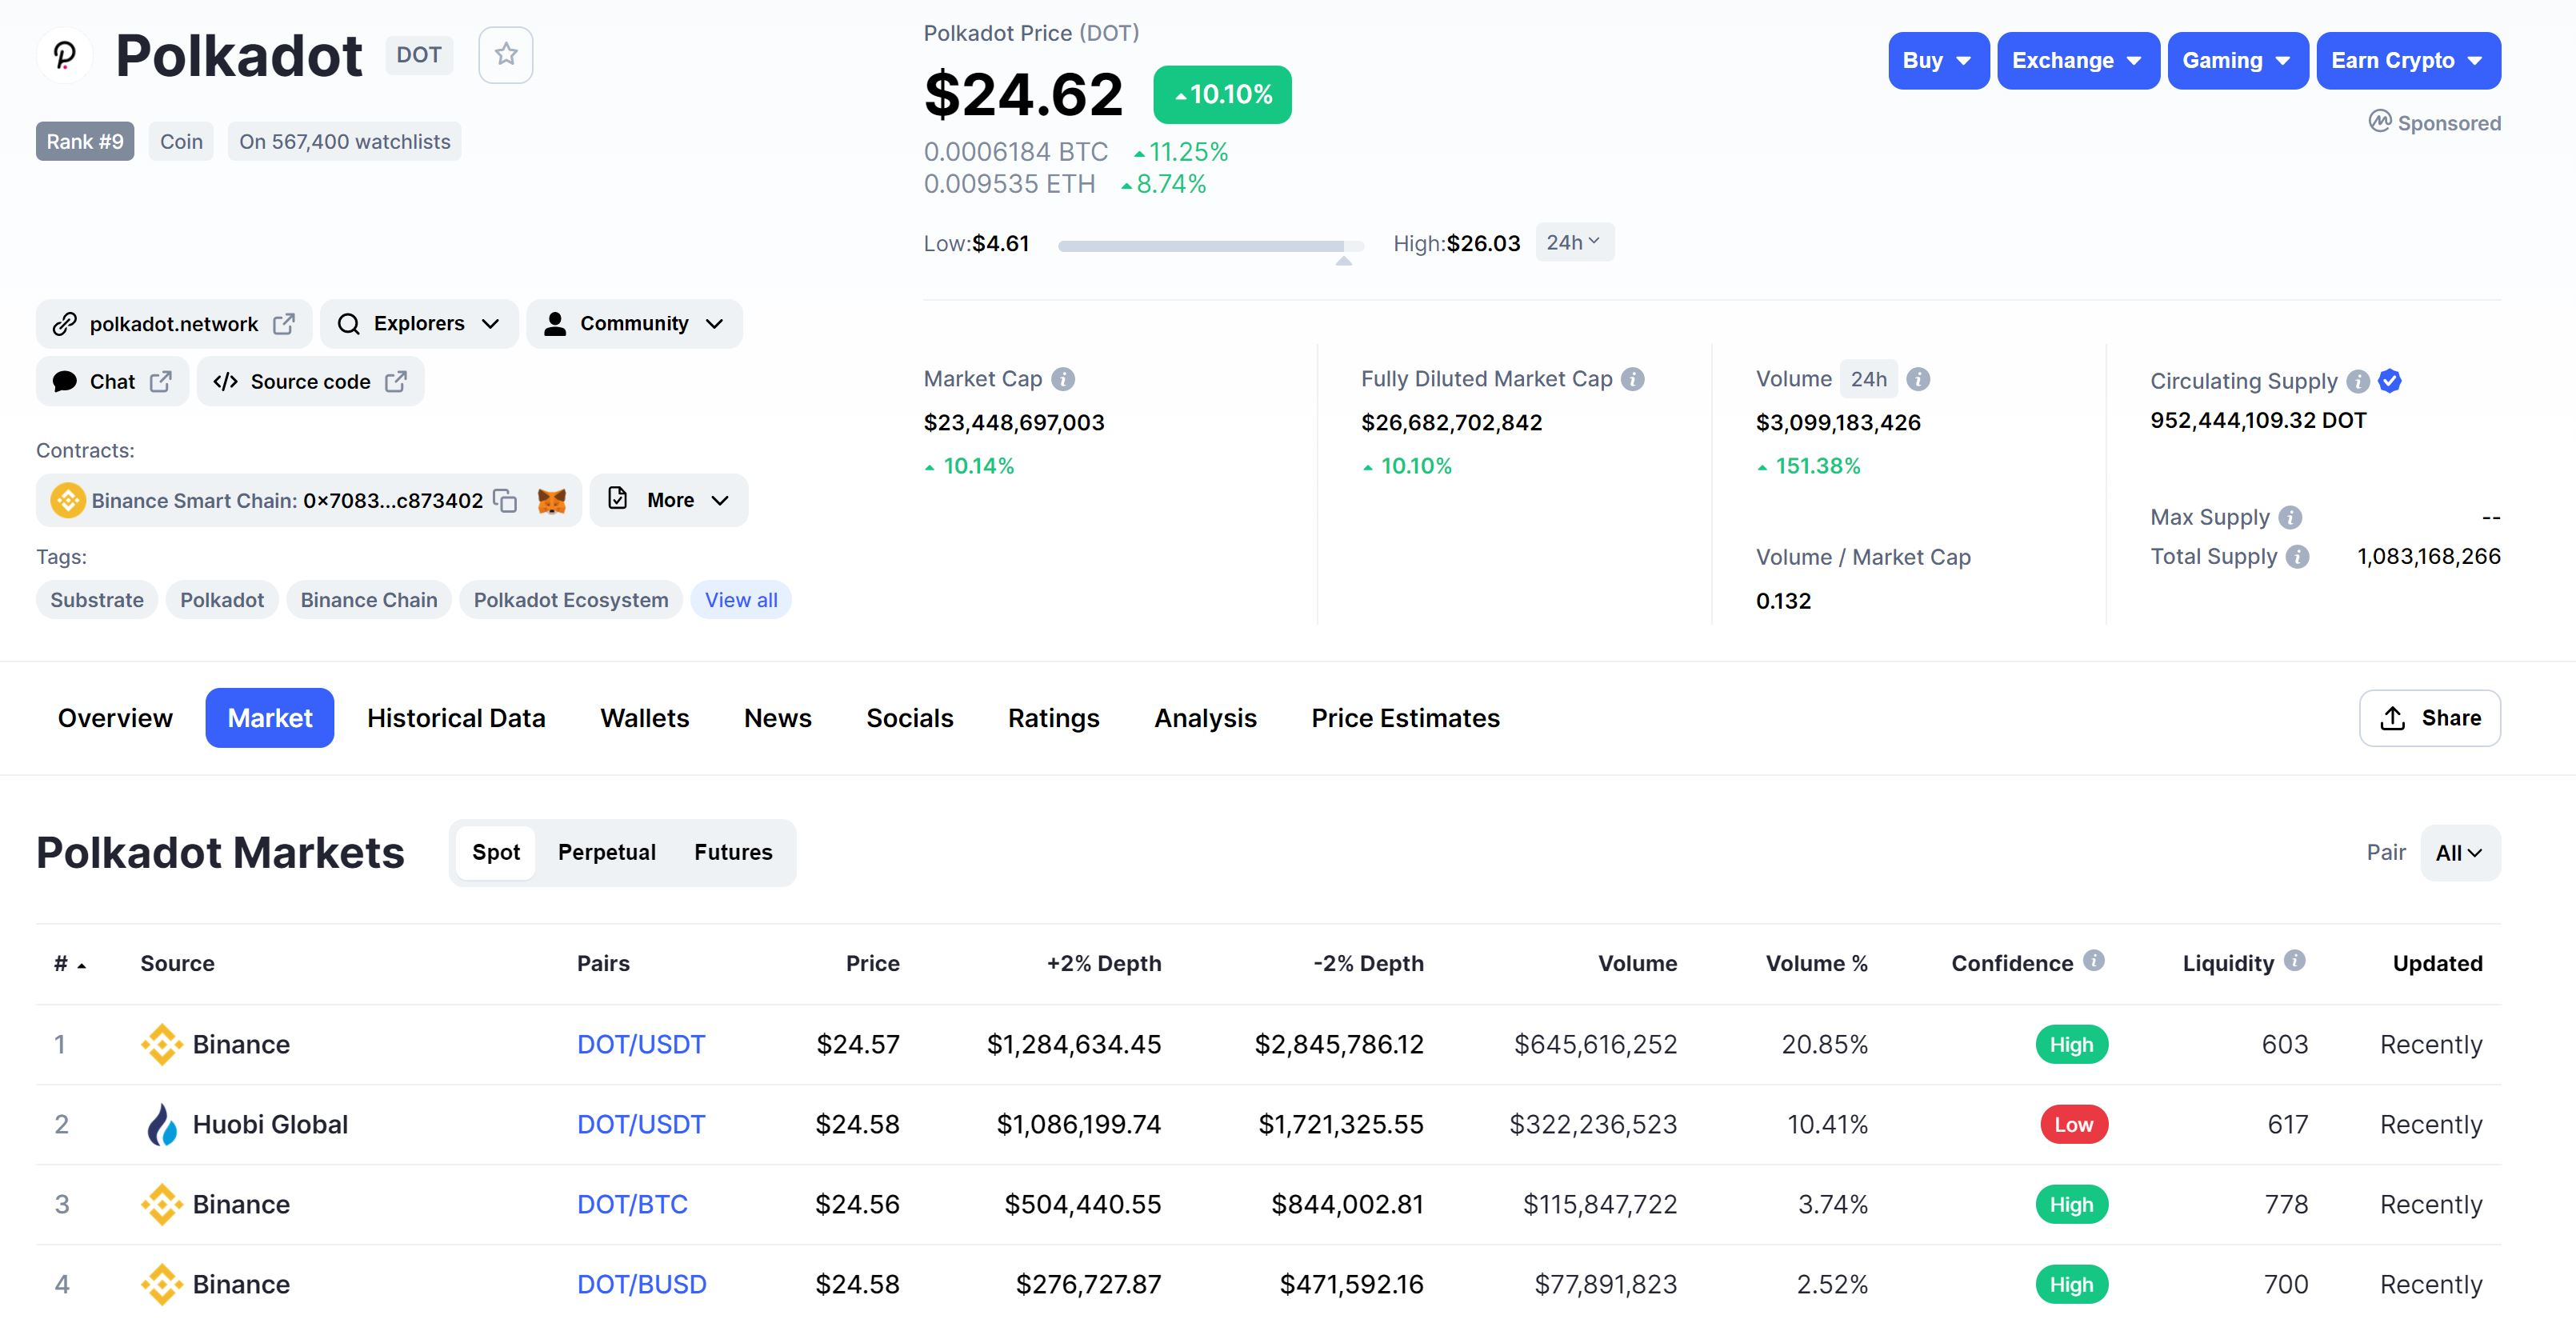 Aperçu des marchés de Polkadot CoinMarketCap